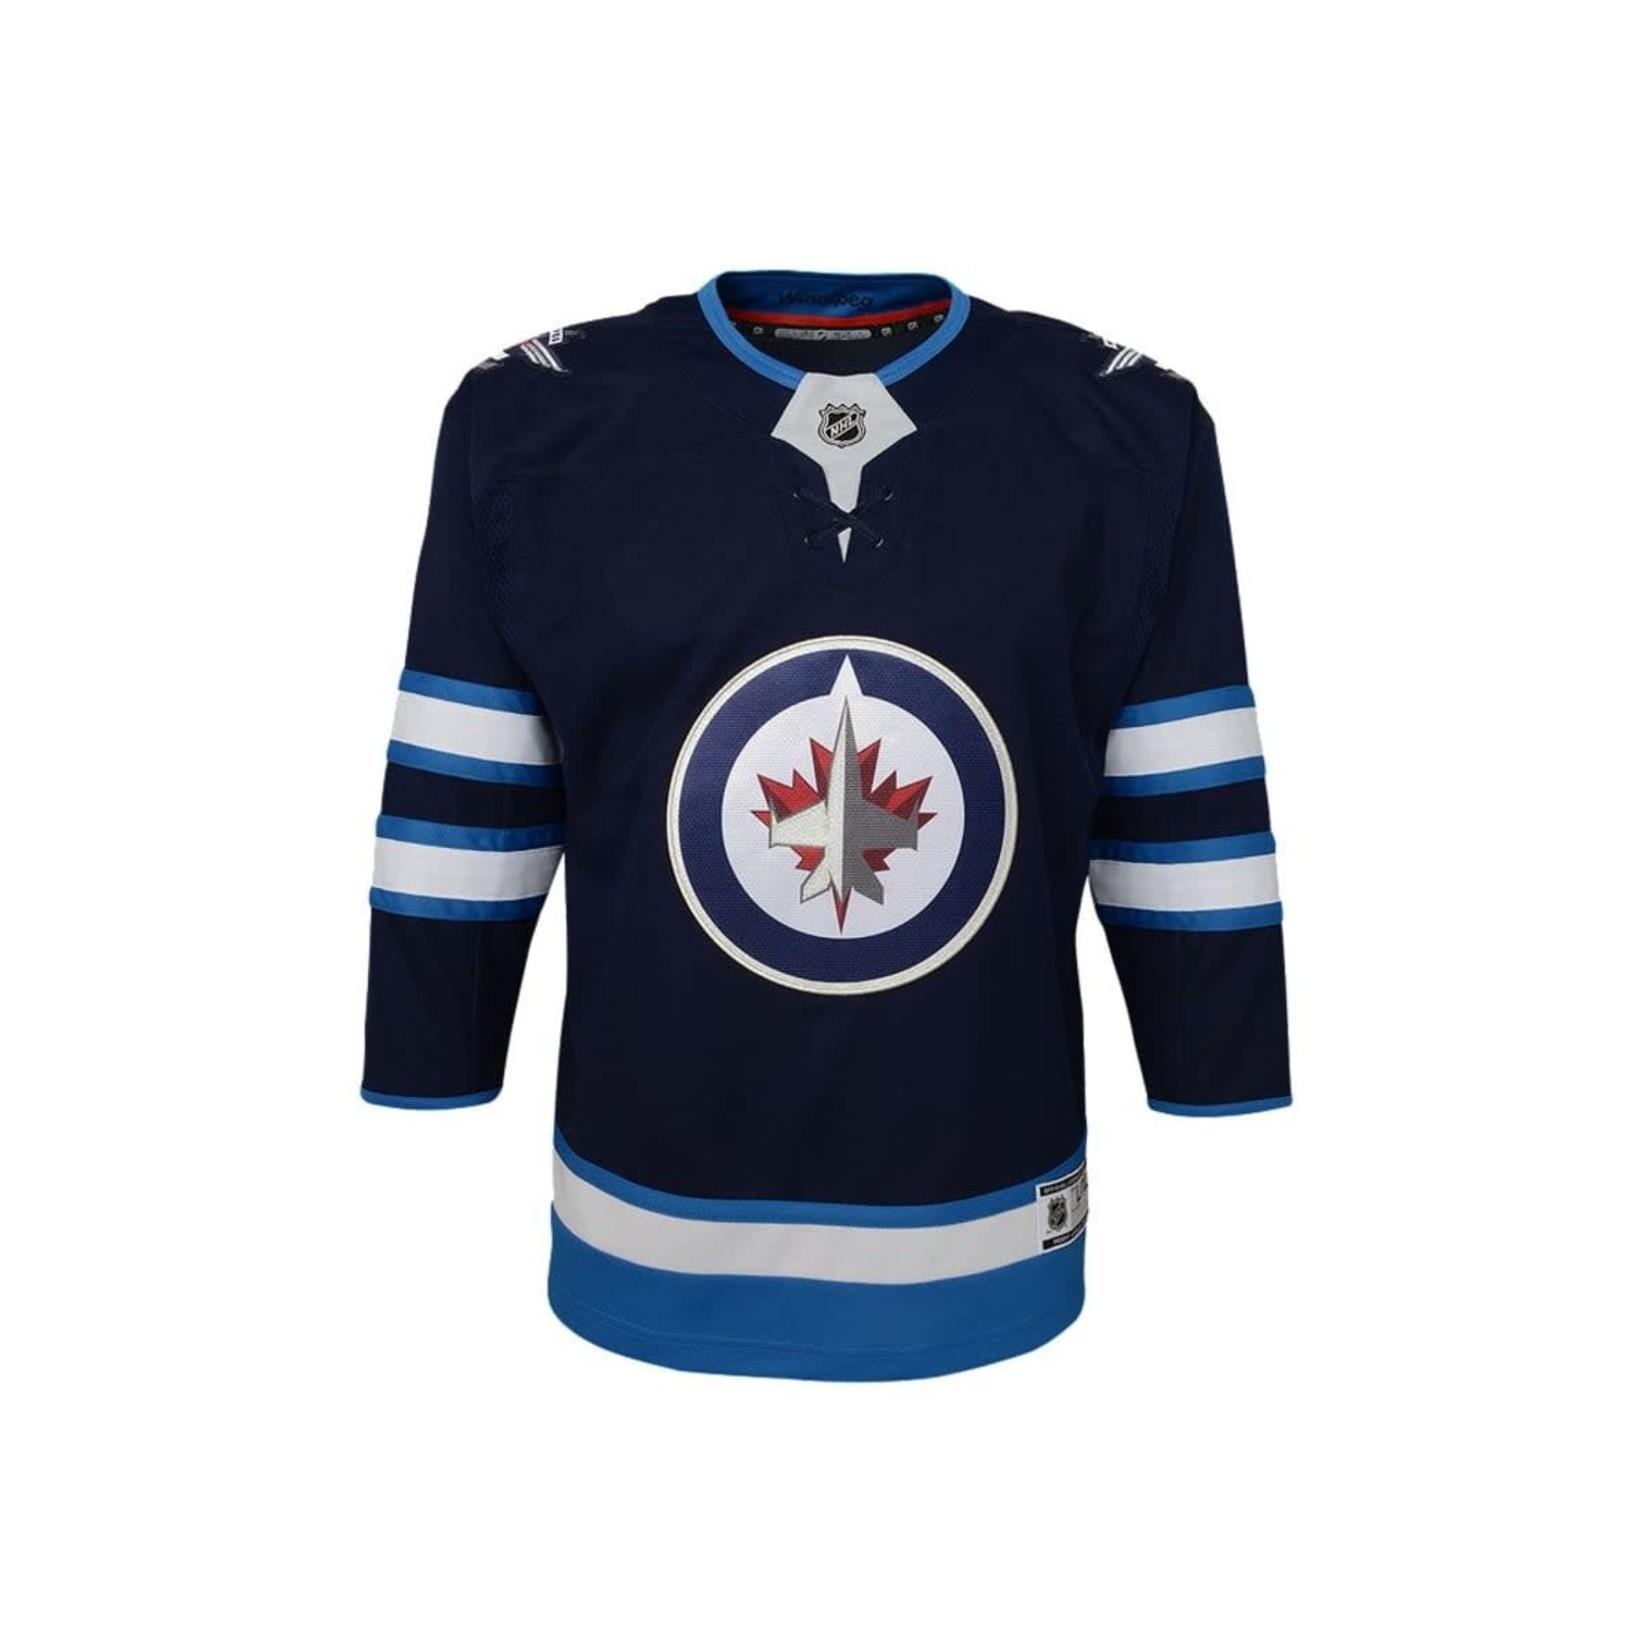 Outerstuff Outerstuff Hockey Jersey, Replica, Home, NHL, Child, Winnipeg Jets 4/7